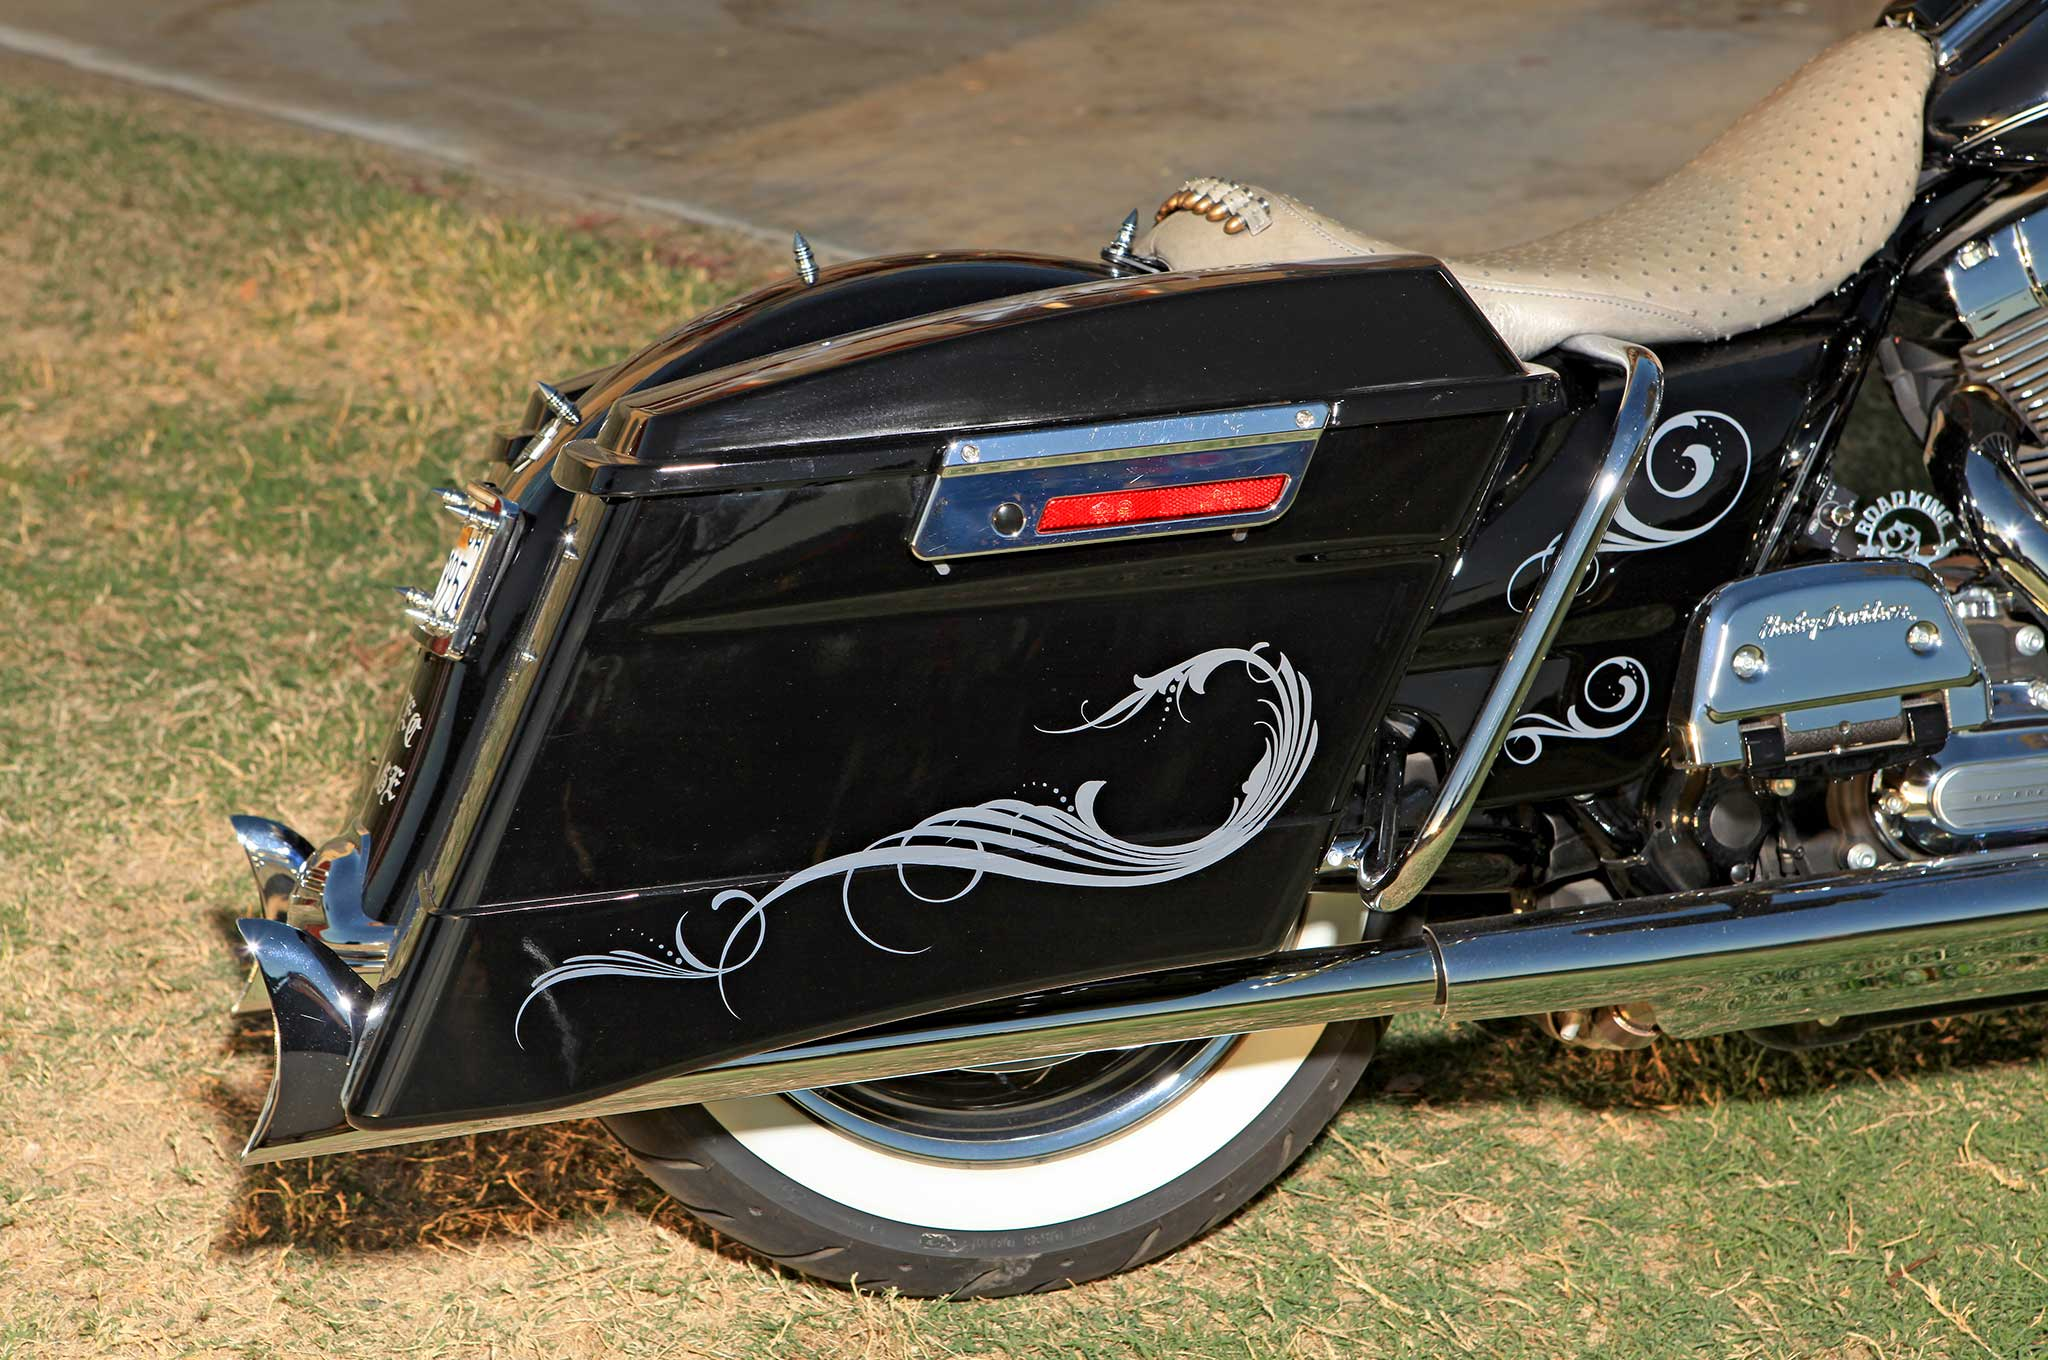 2012 Harley Davidson Road King Childhood Hero Lowrider